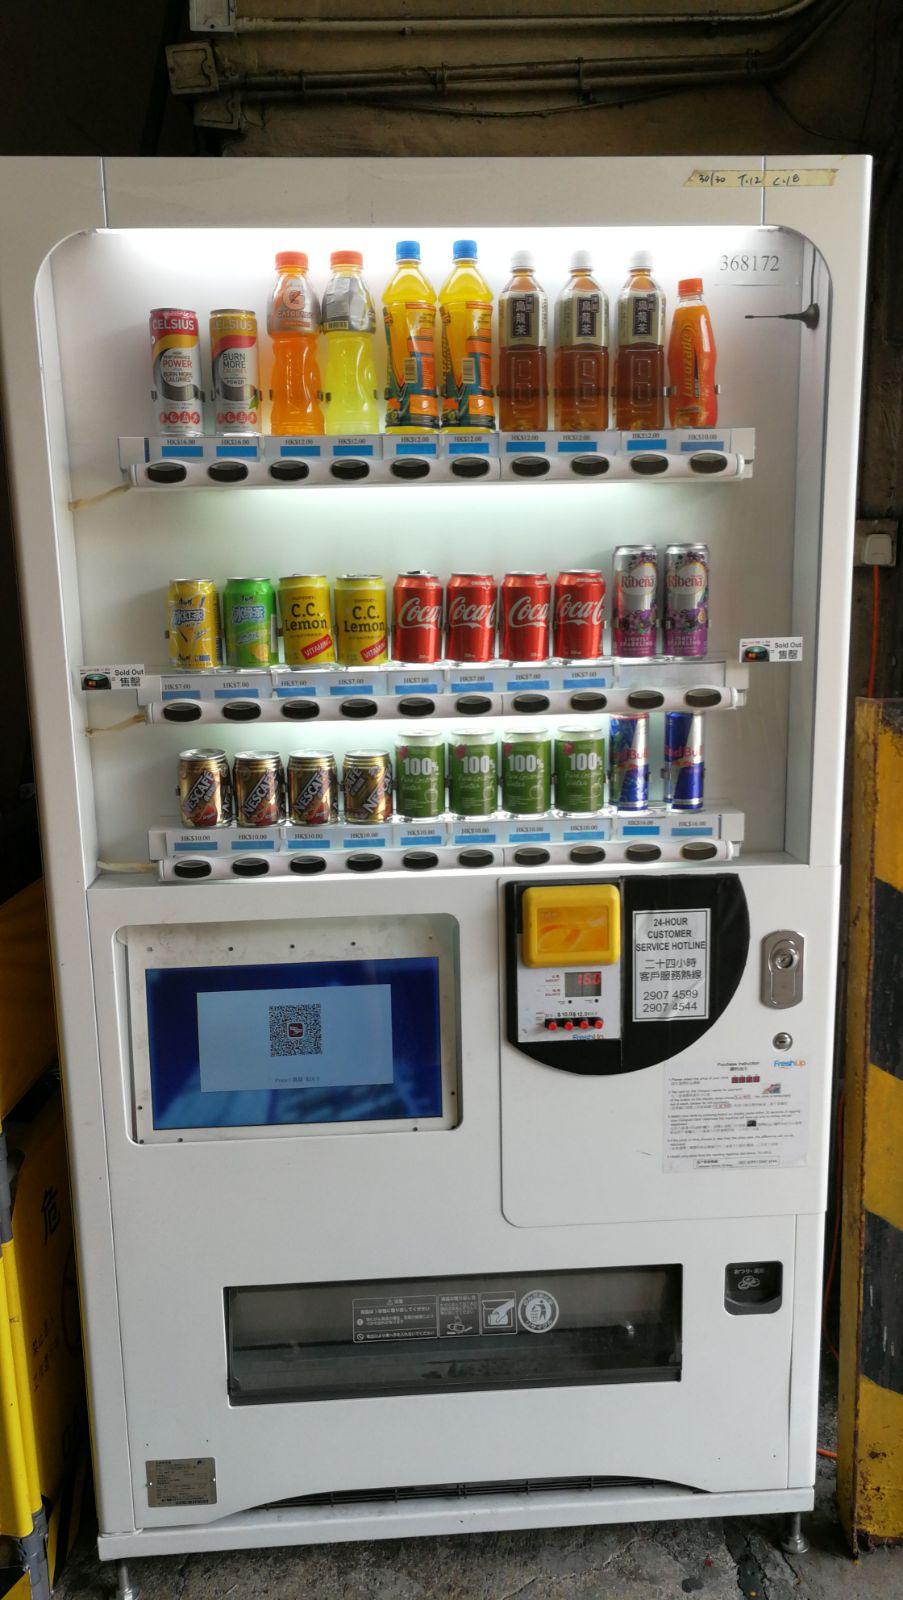 FreshUp,自動售賣機,自動販賣機,零食,飲品,方便,快捷,智能,佳定集團,屋苑,寫字樓